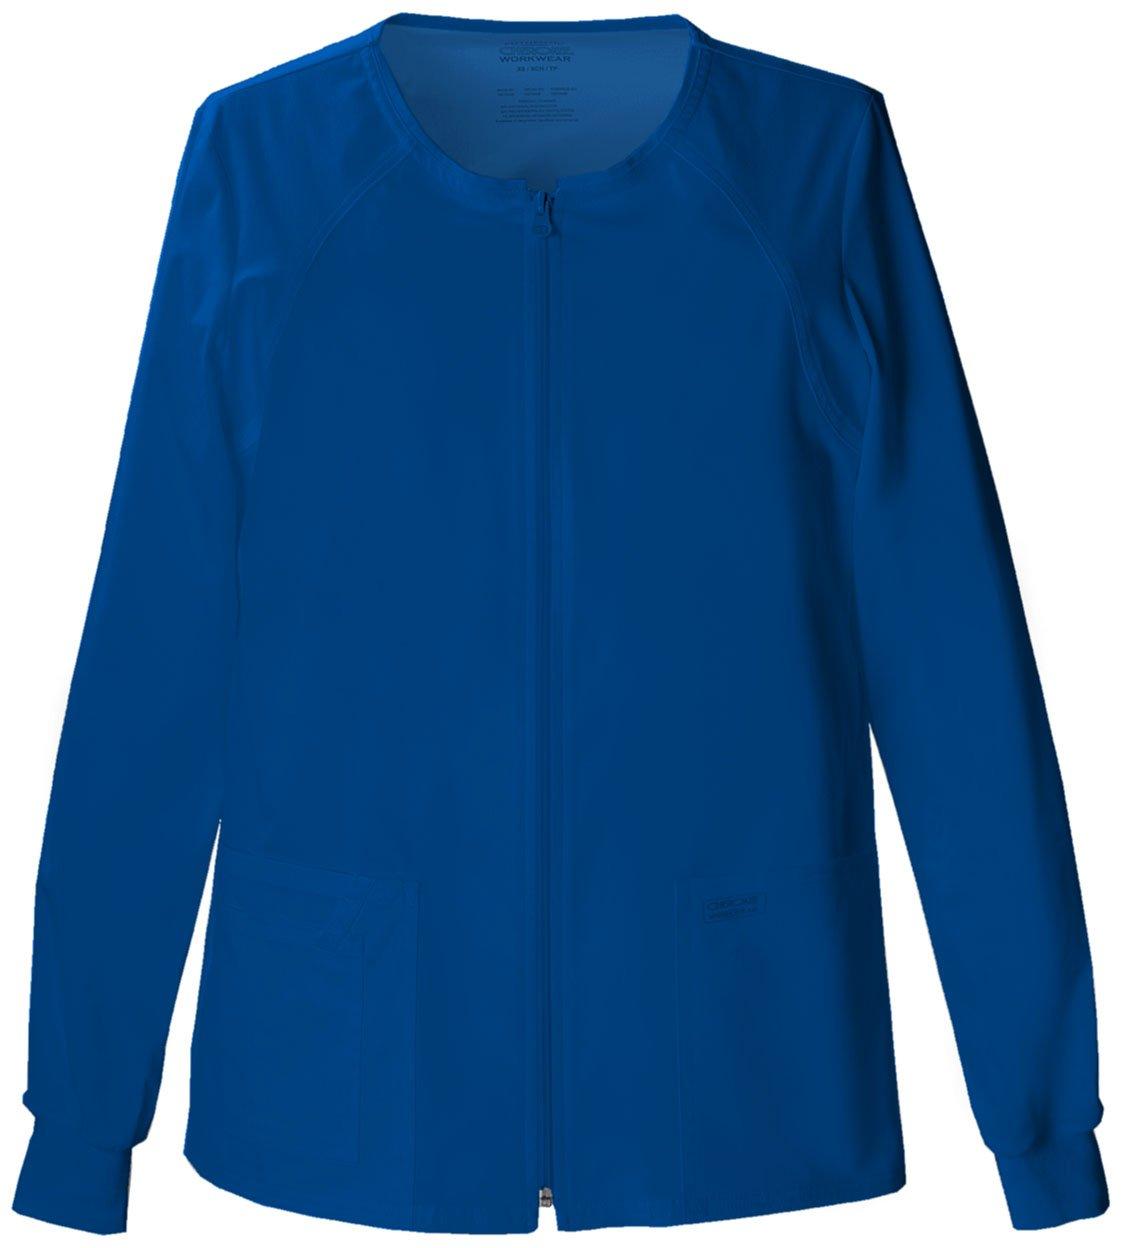 WorkWear by Cherokee 4315 Women's Zip Front Warm-Up Jacket Dark Khaki X-Small